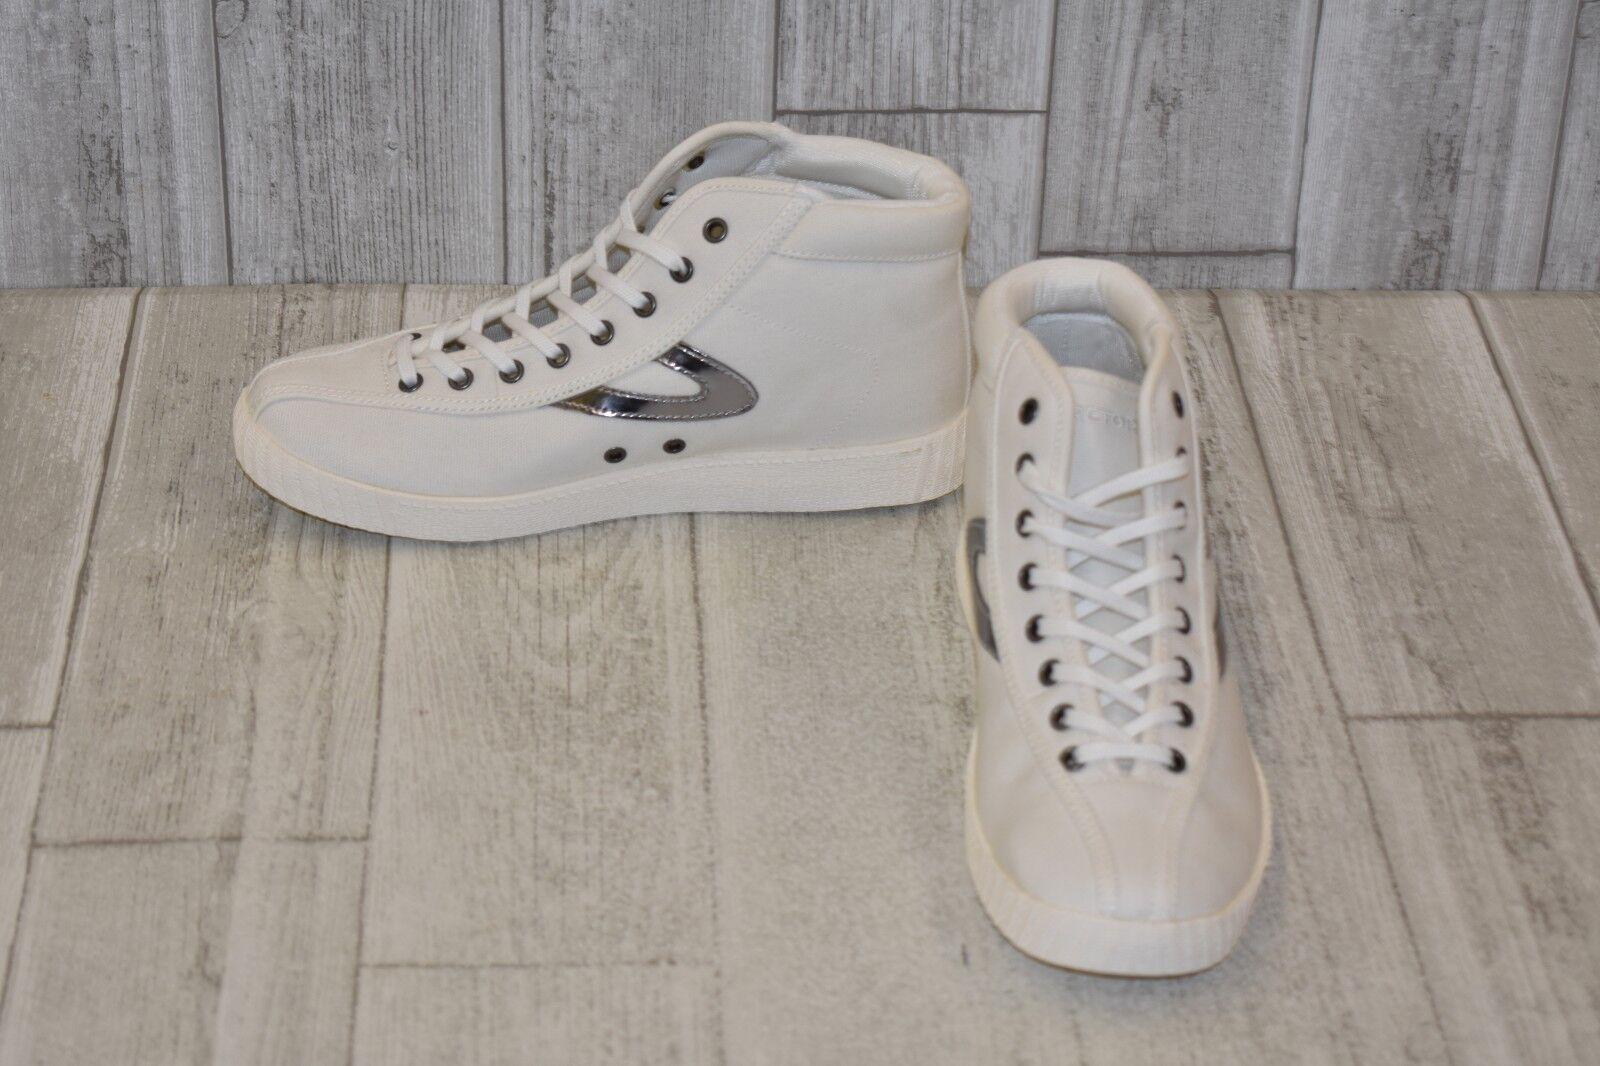 Tretorn Nylite Hi Sneaker, Women's Size 8, White